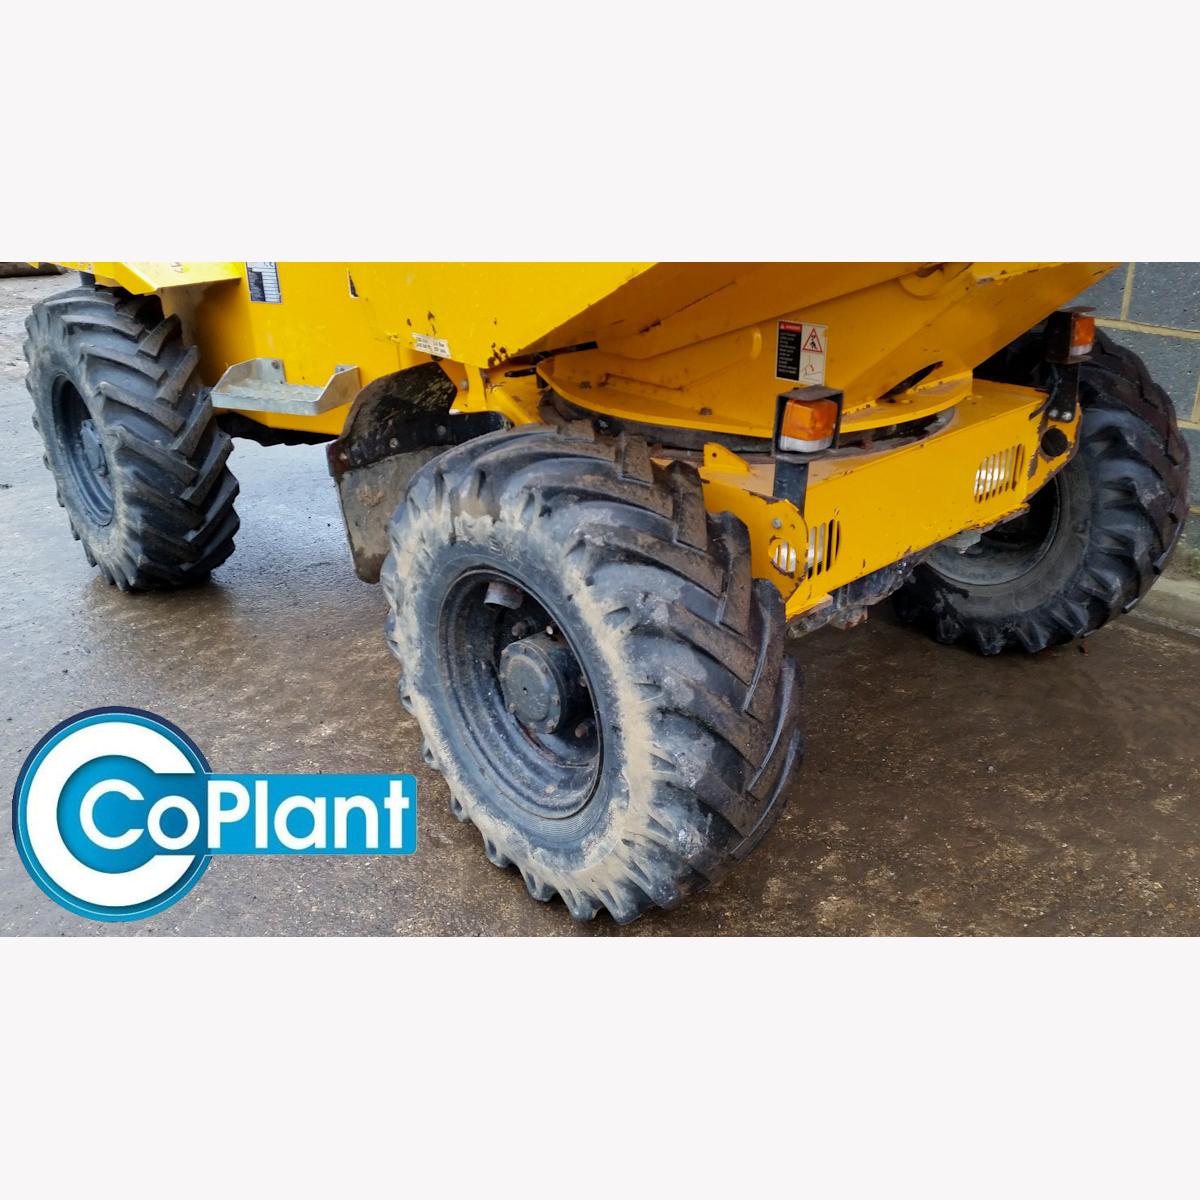 3 Ton Thwaites Dumper available from CoPlant Ltd